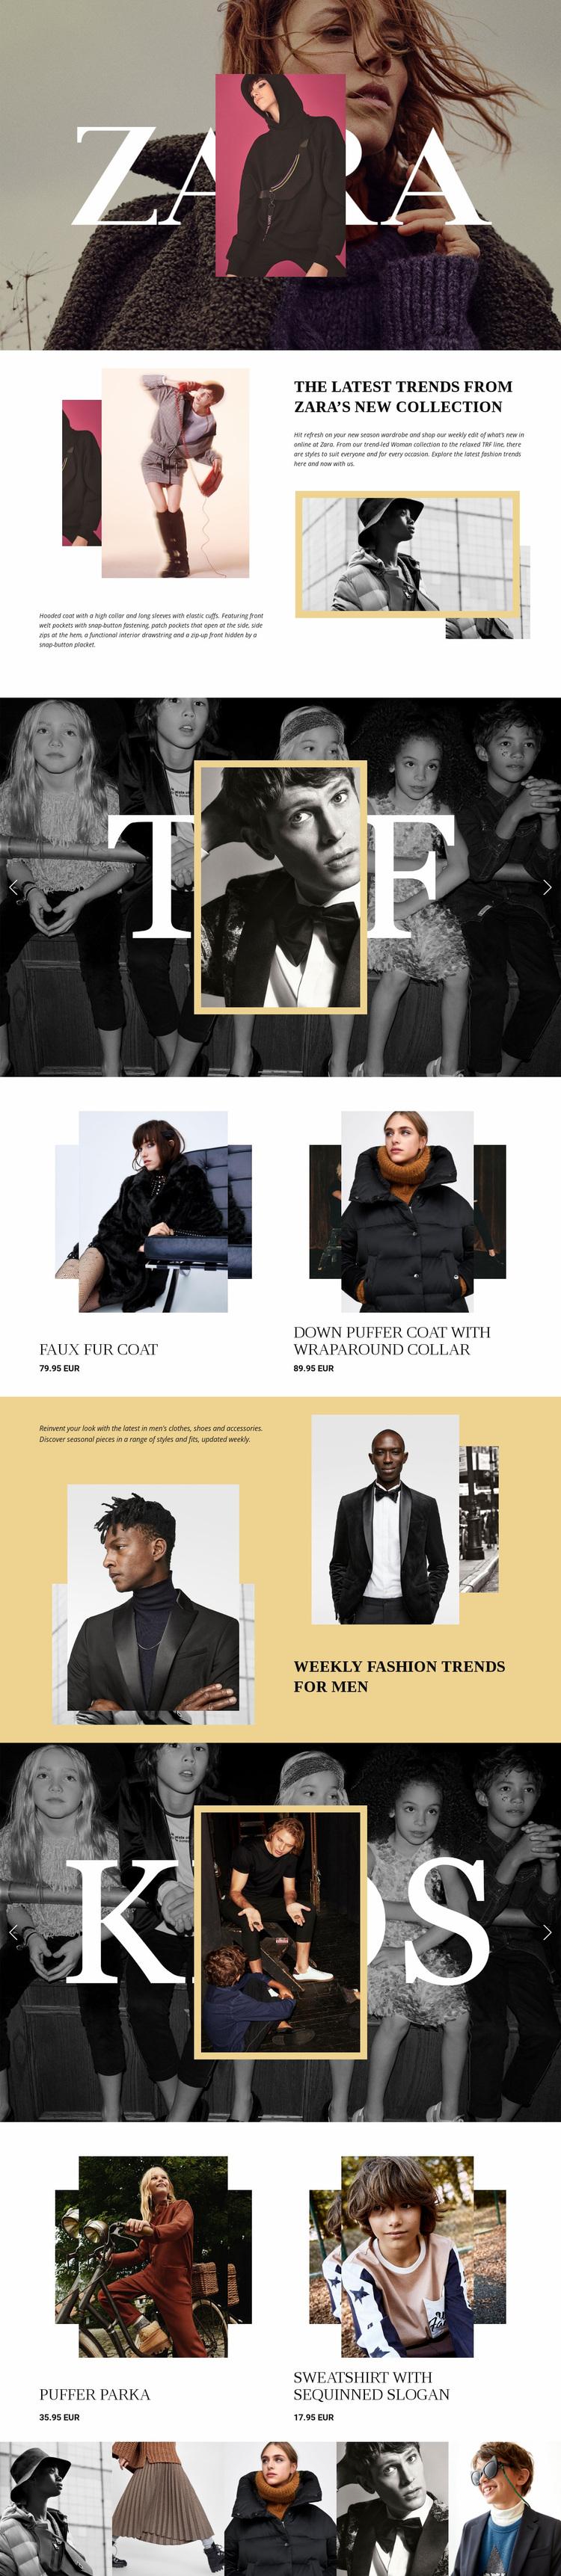 Zara Website Design